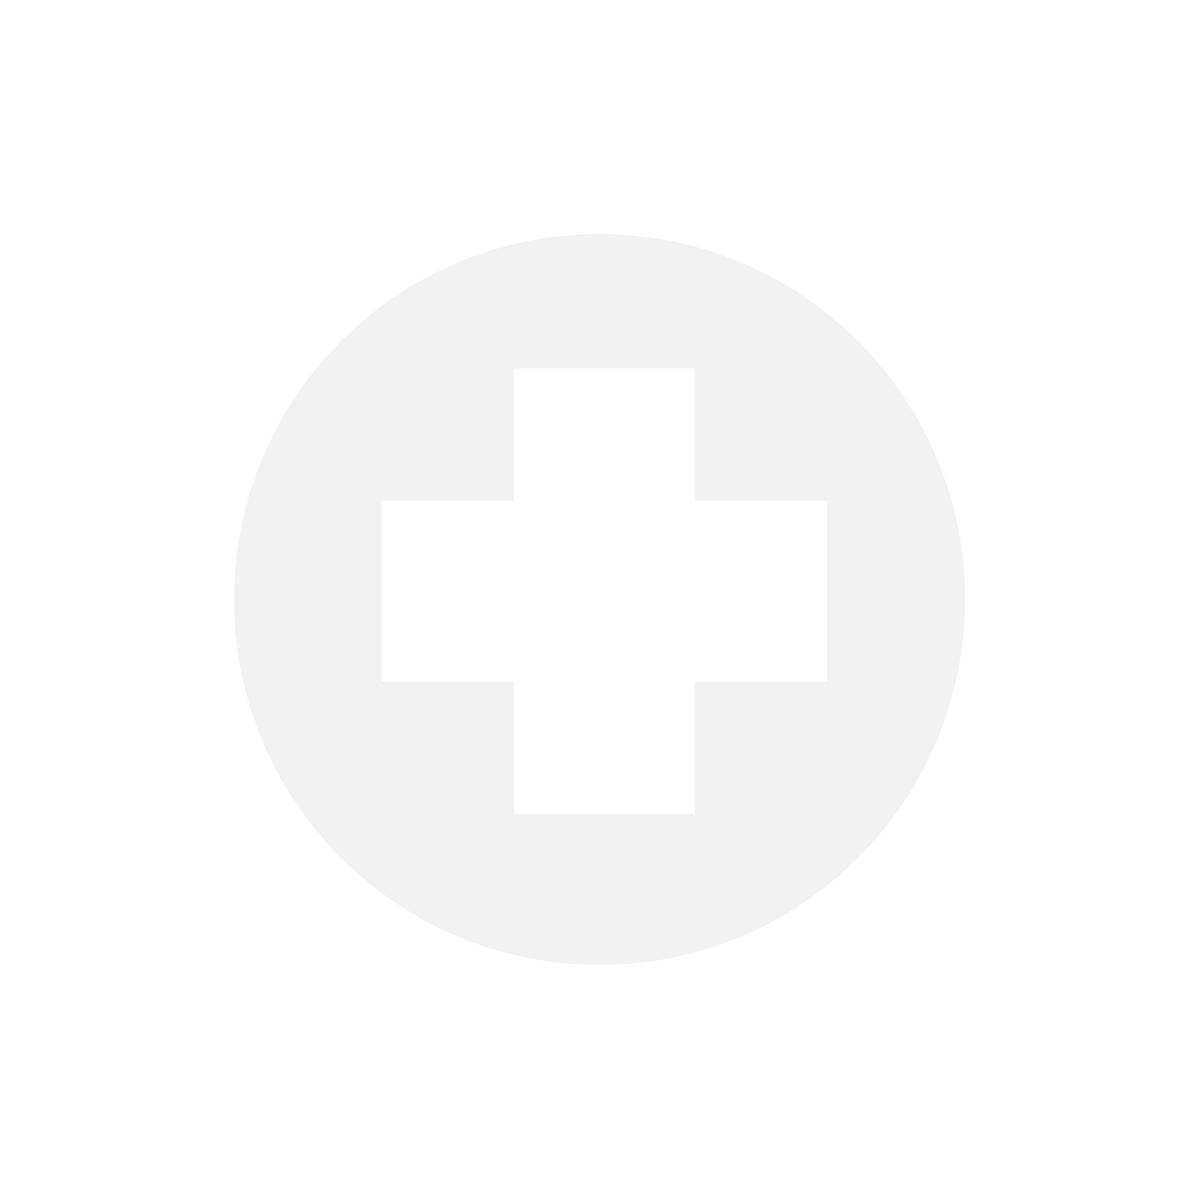 5710 - Ultrason tête bi-fréquence